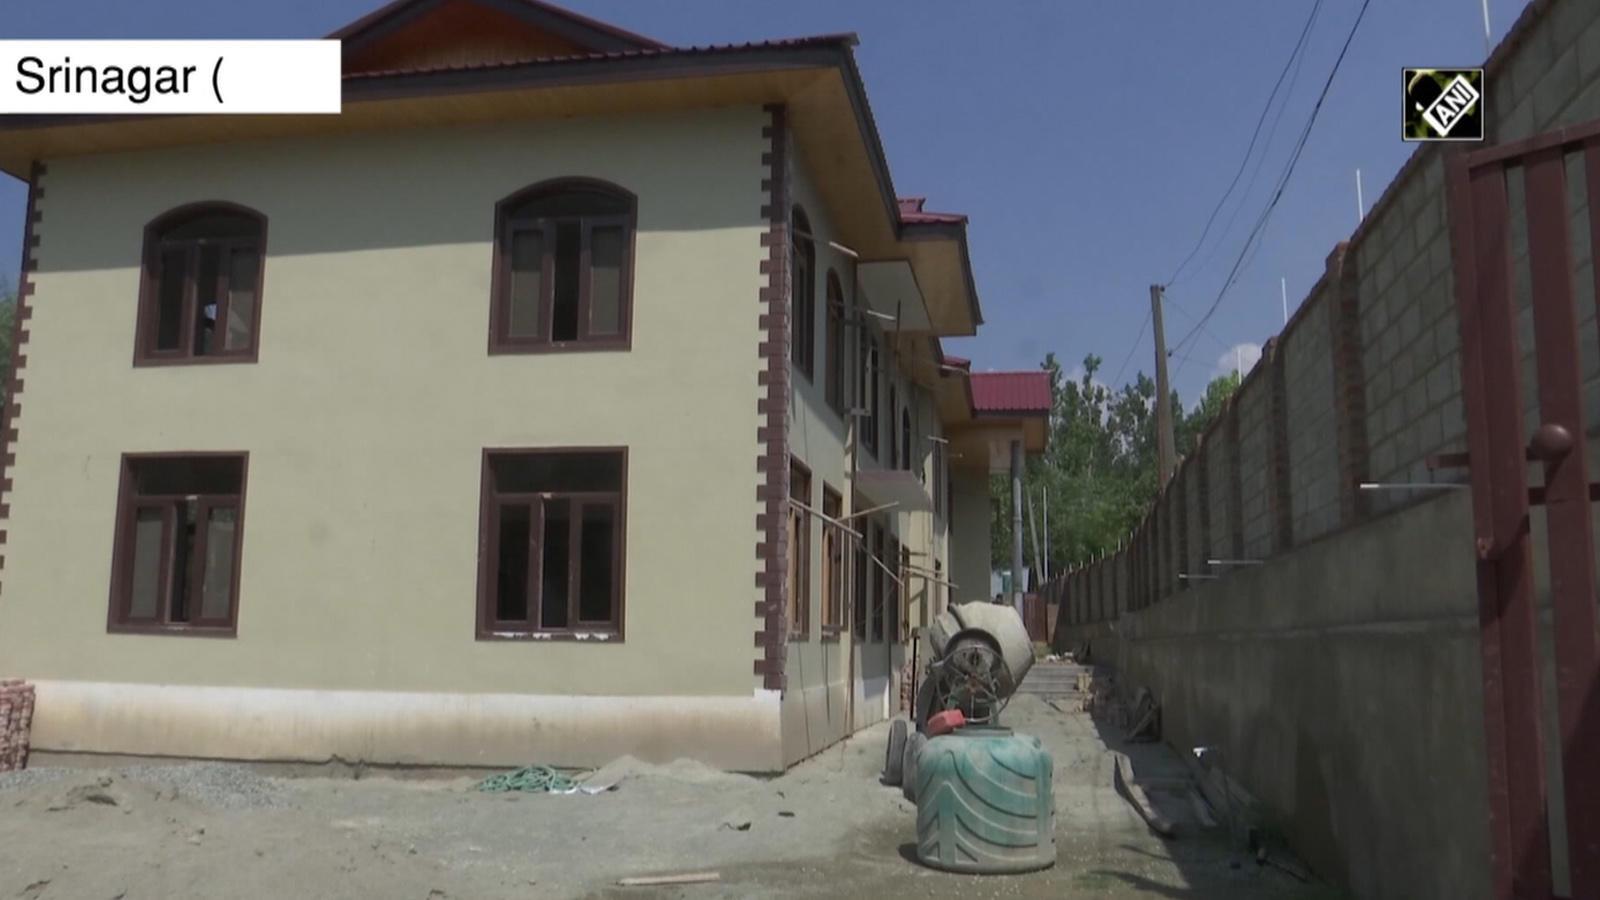 community-facilitation-centre-in-srinagar-to-help-organise-social-gatherings